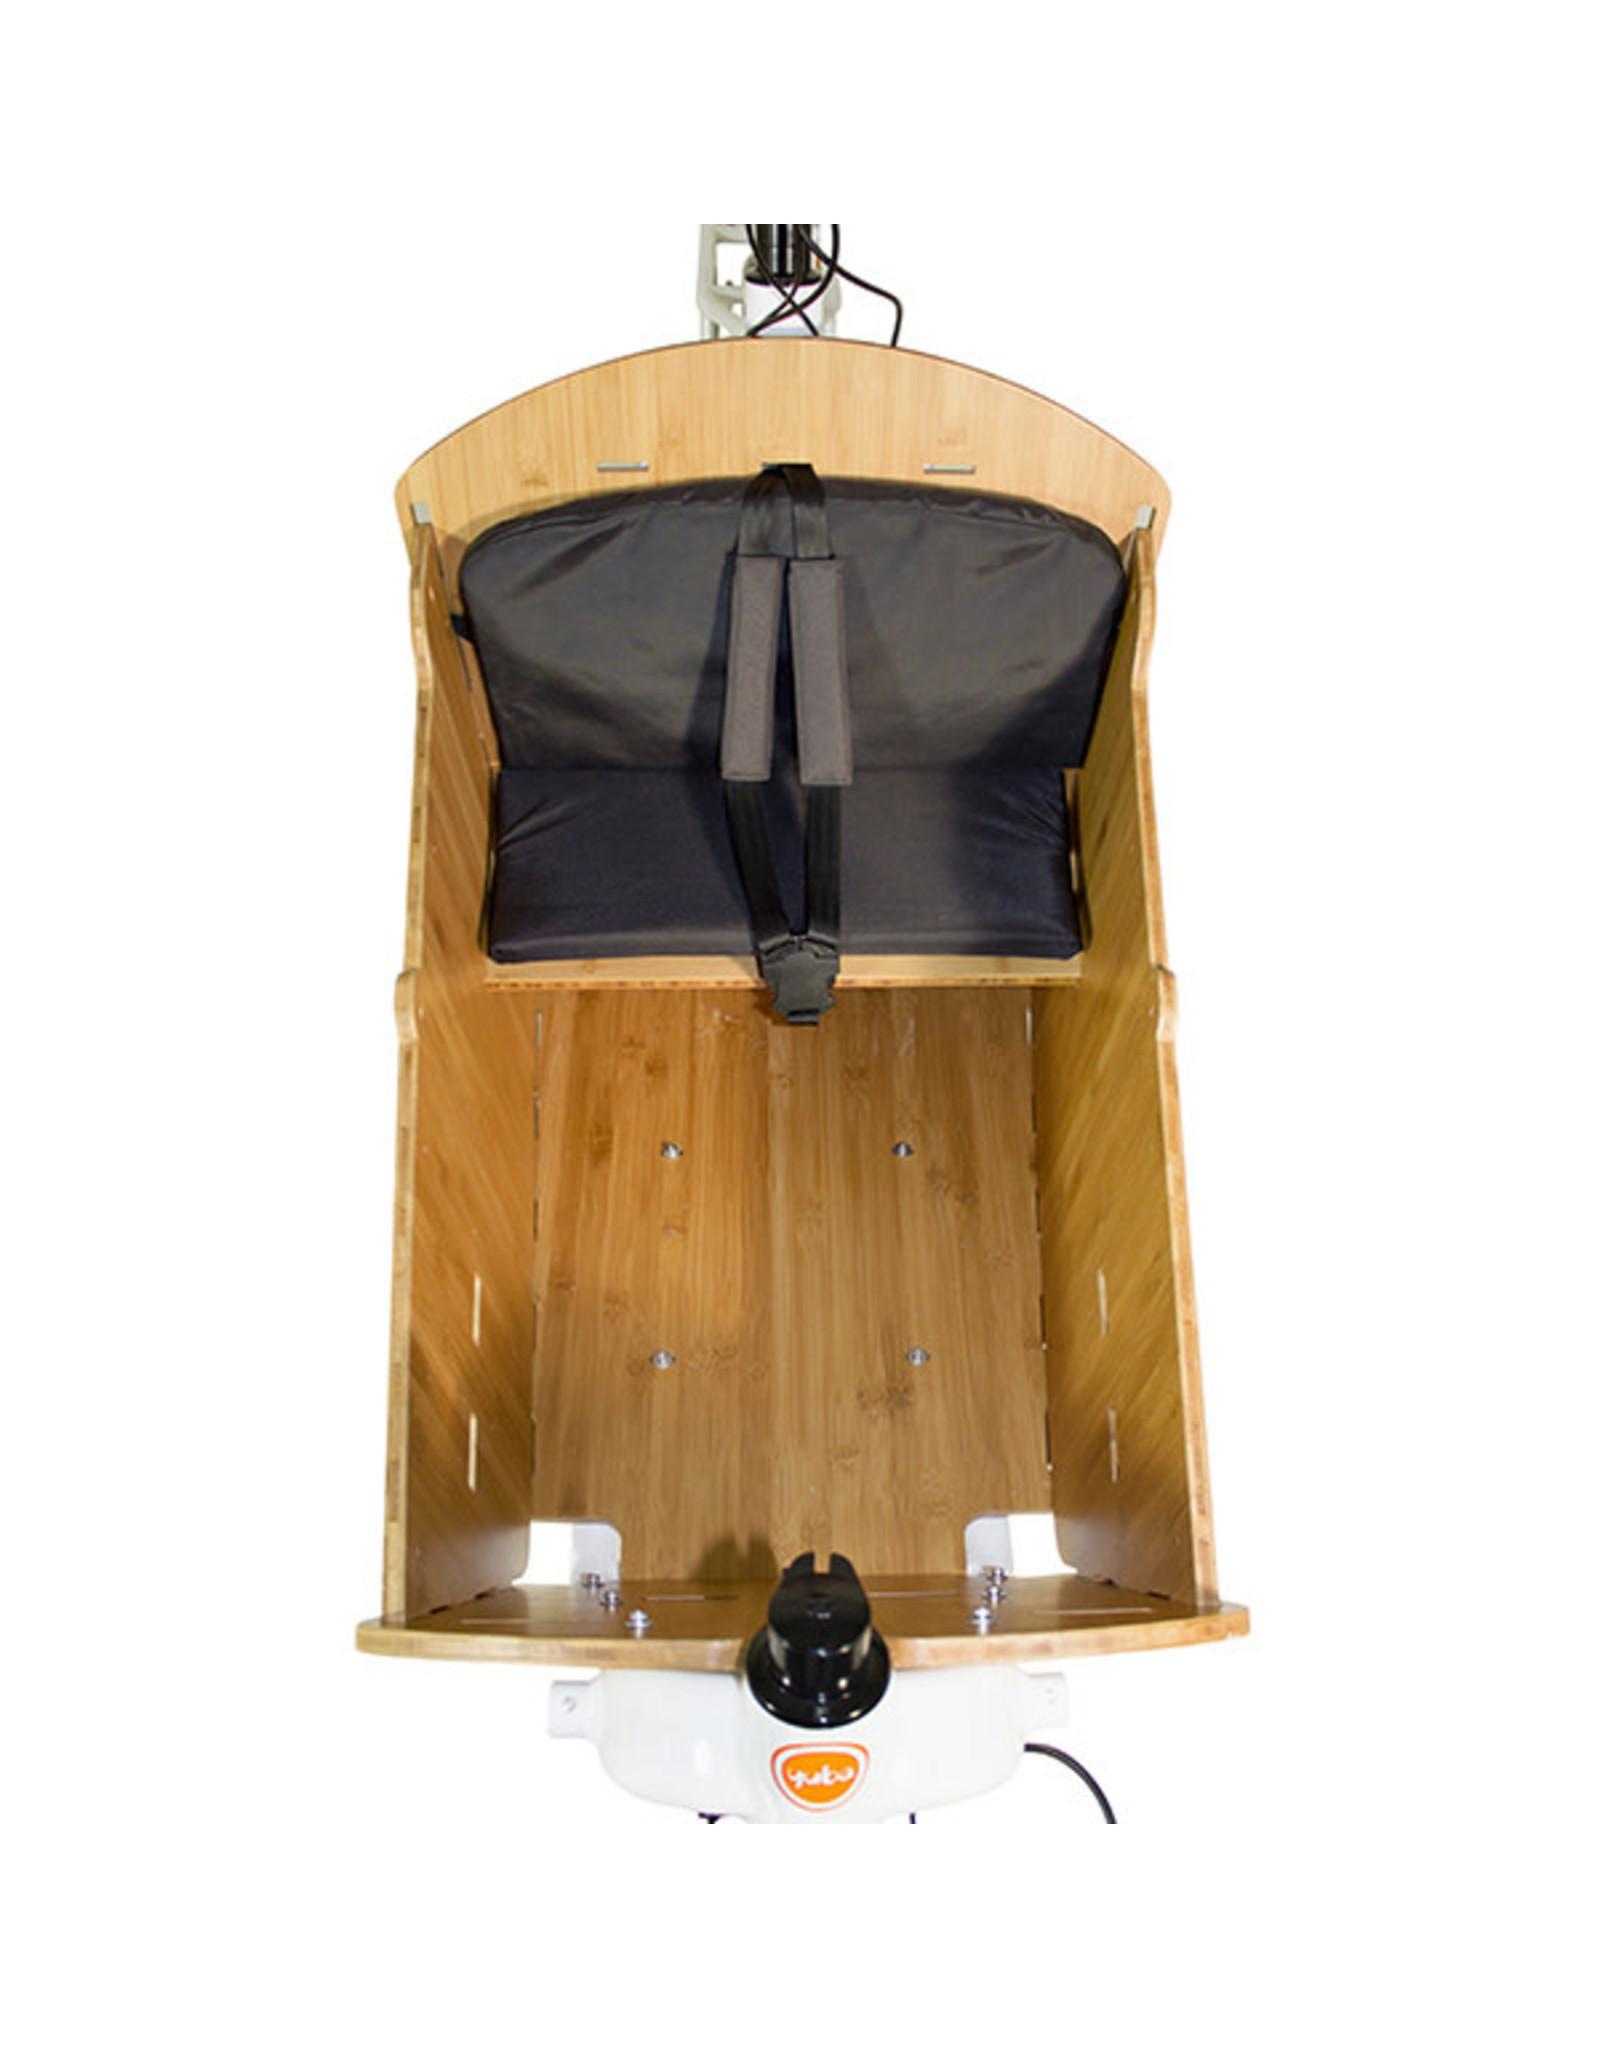 YUBA YUBA SEAT KIT FOR BAMBOO